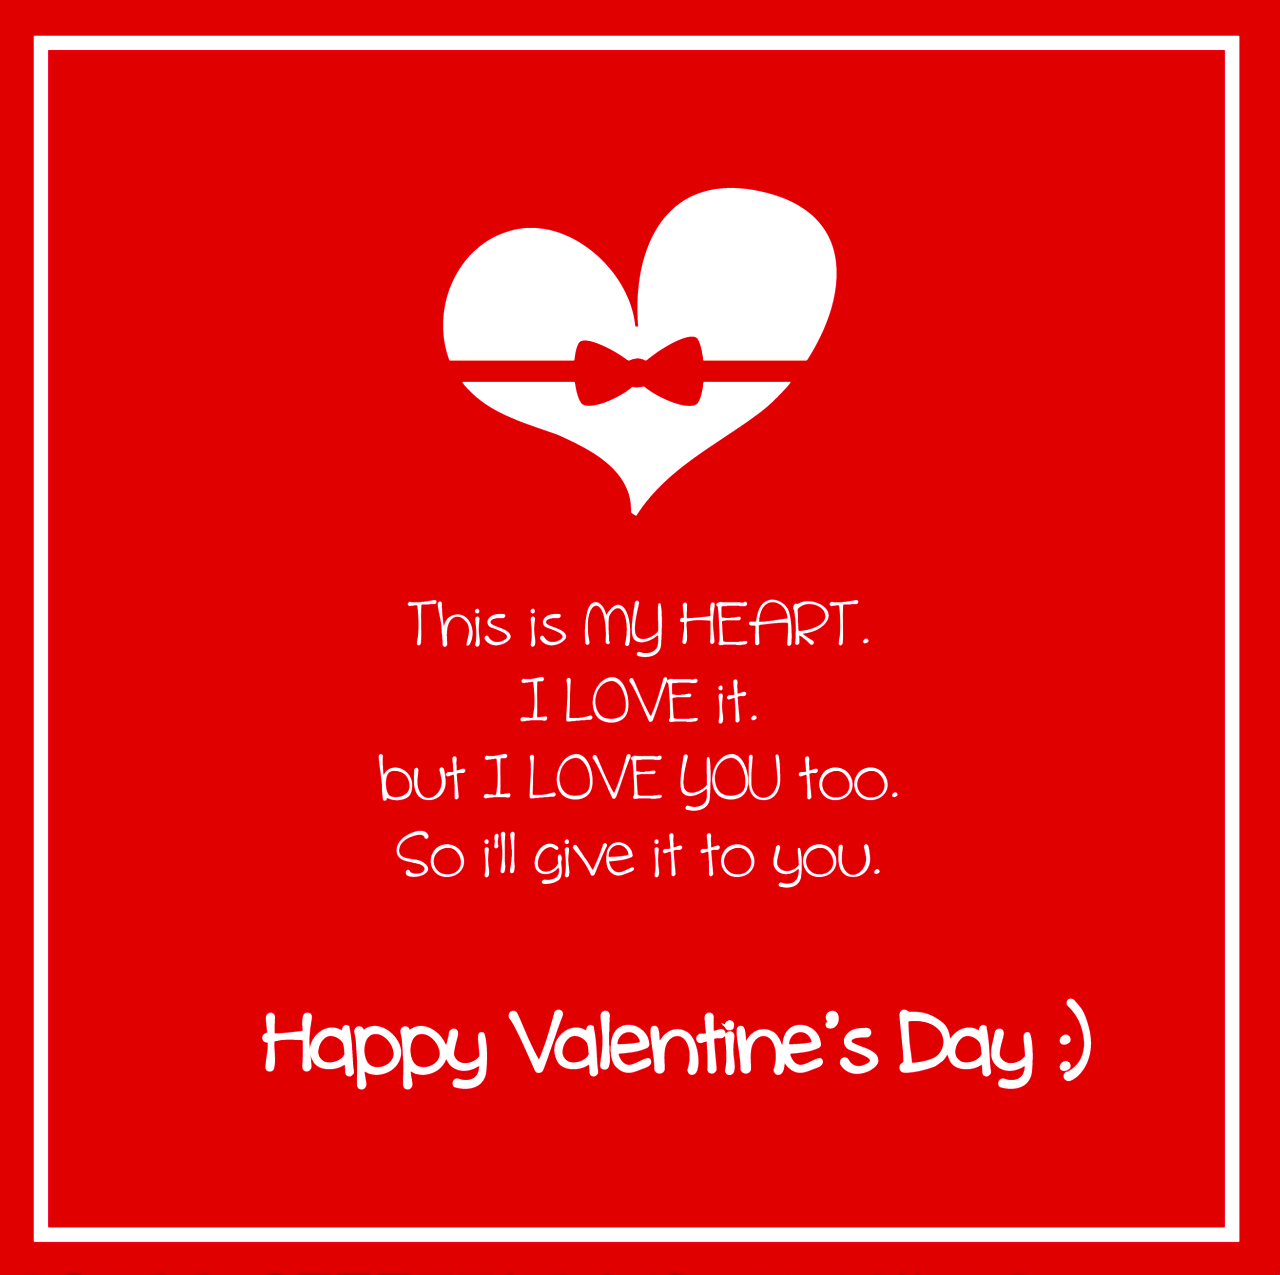 Best Valentine Day Message For Her